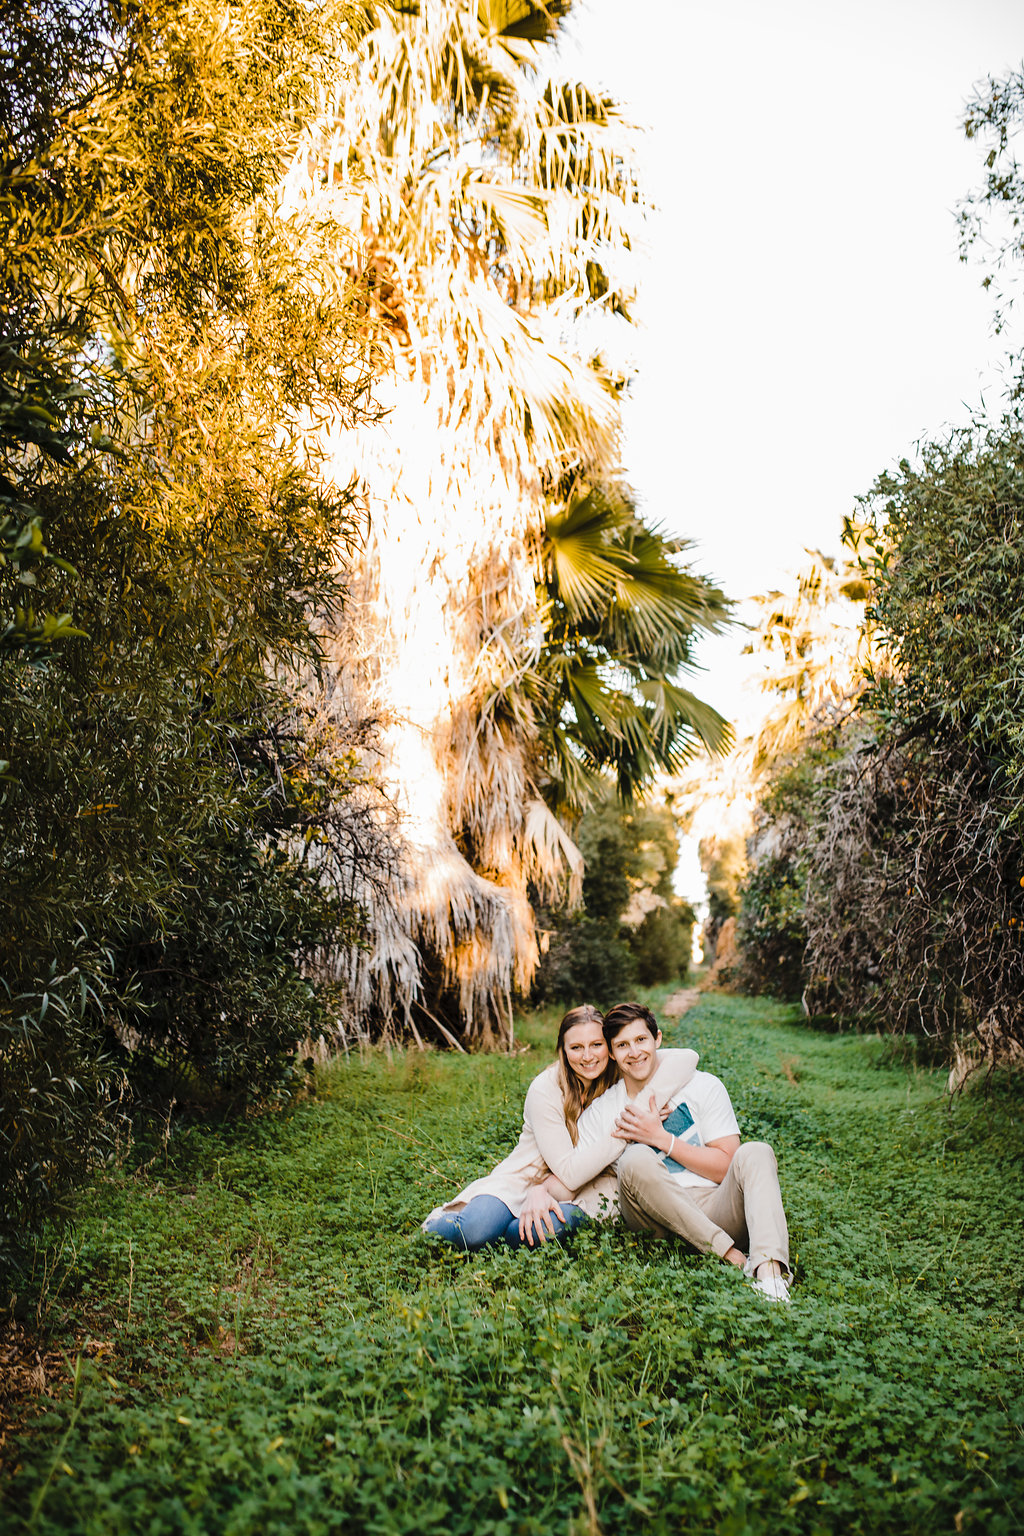 romantic posed engagements couples photography logan utah